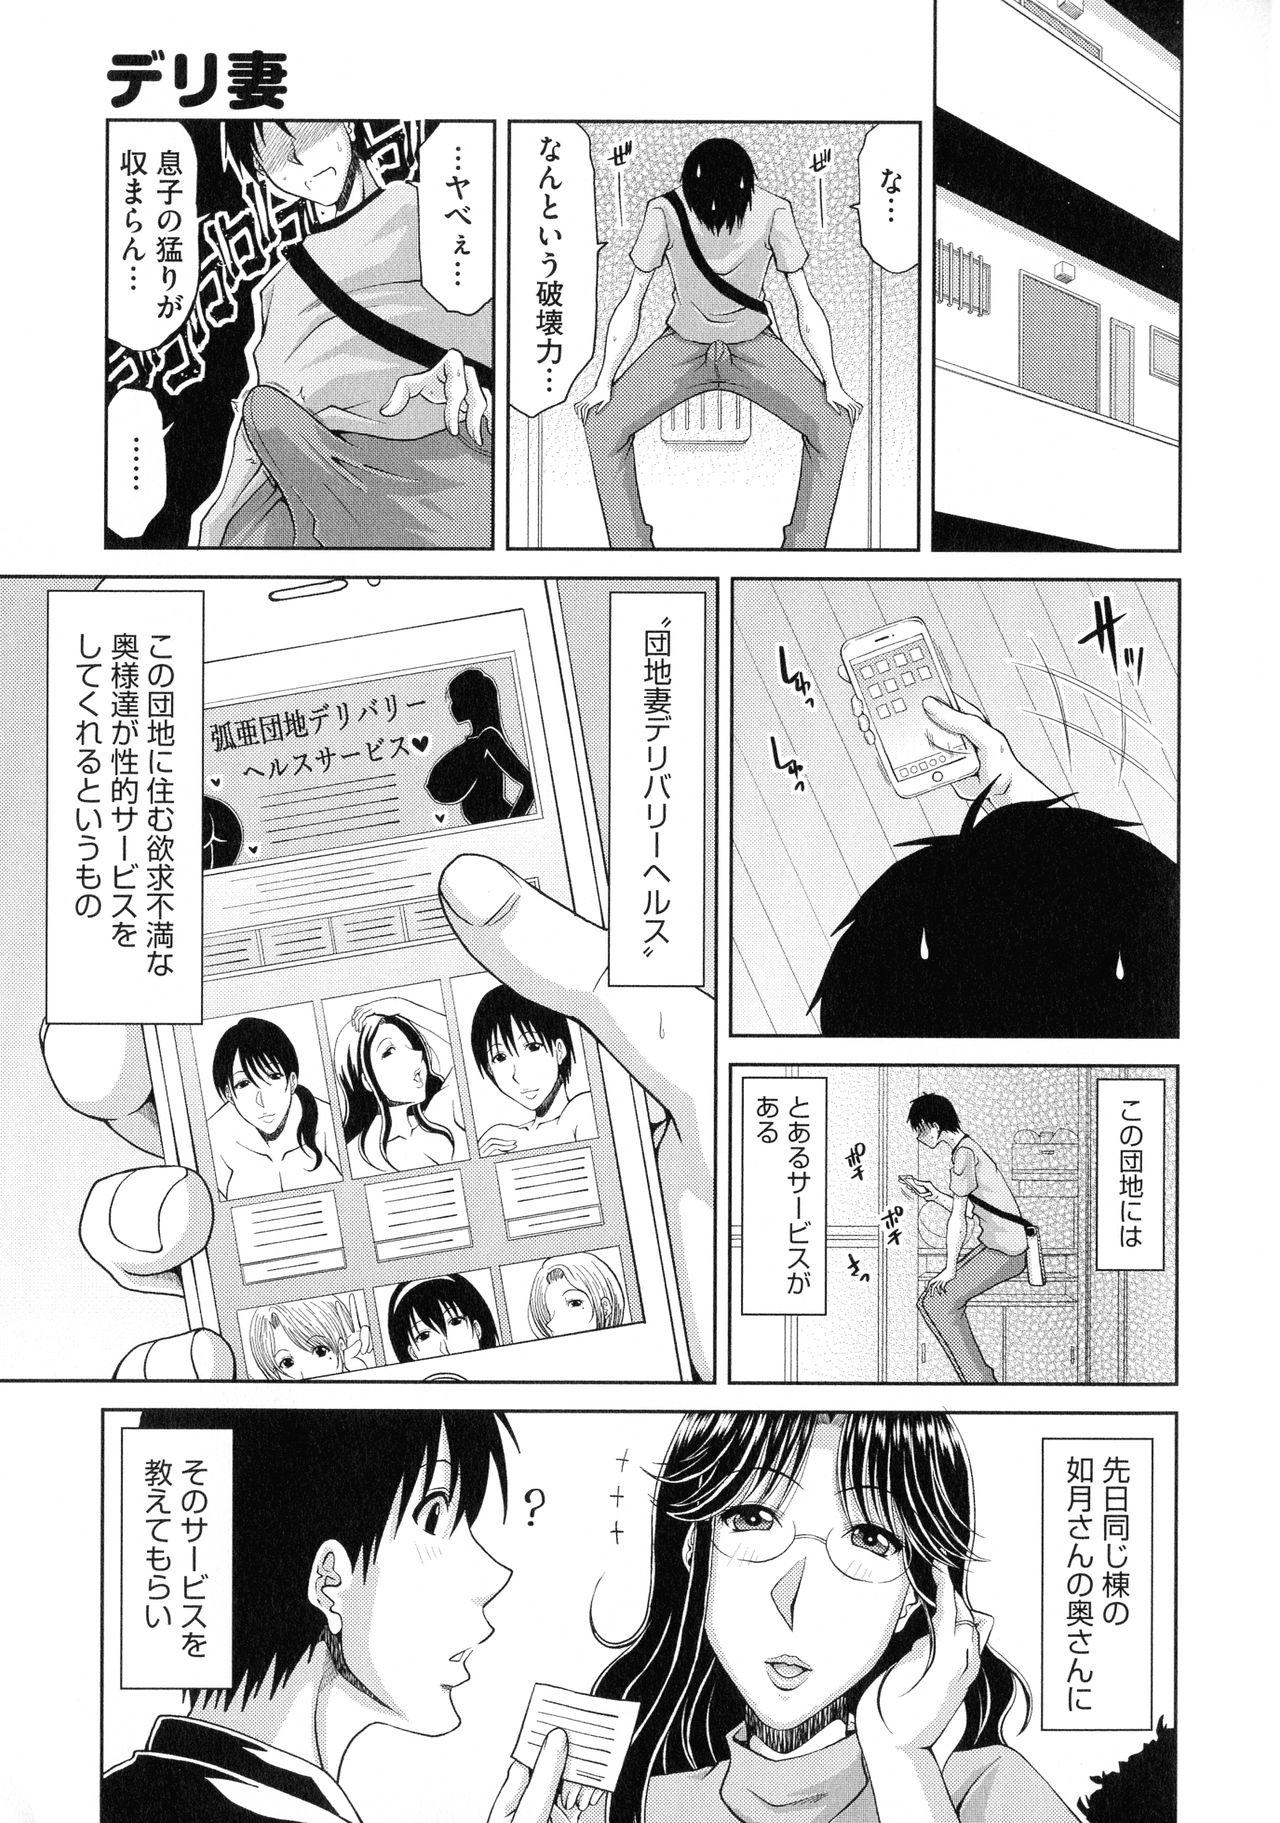 Haramase! 26